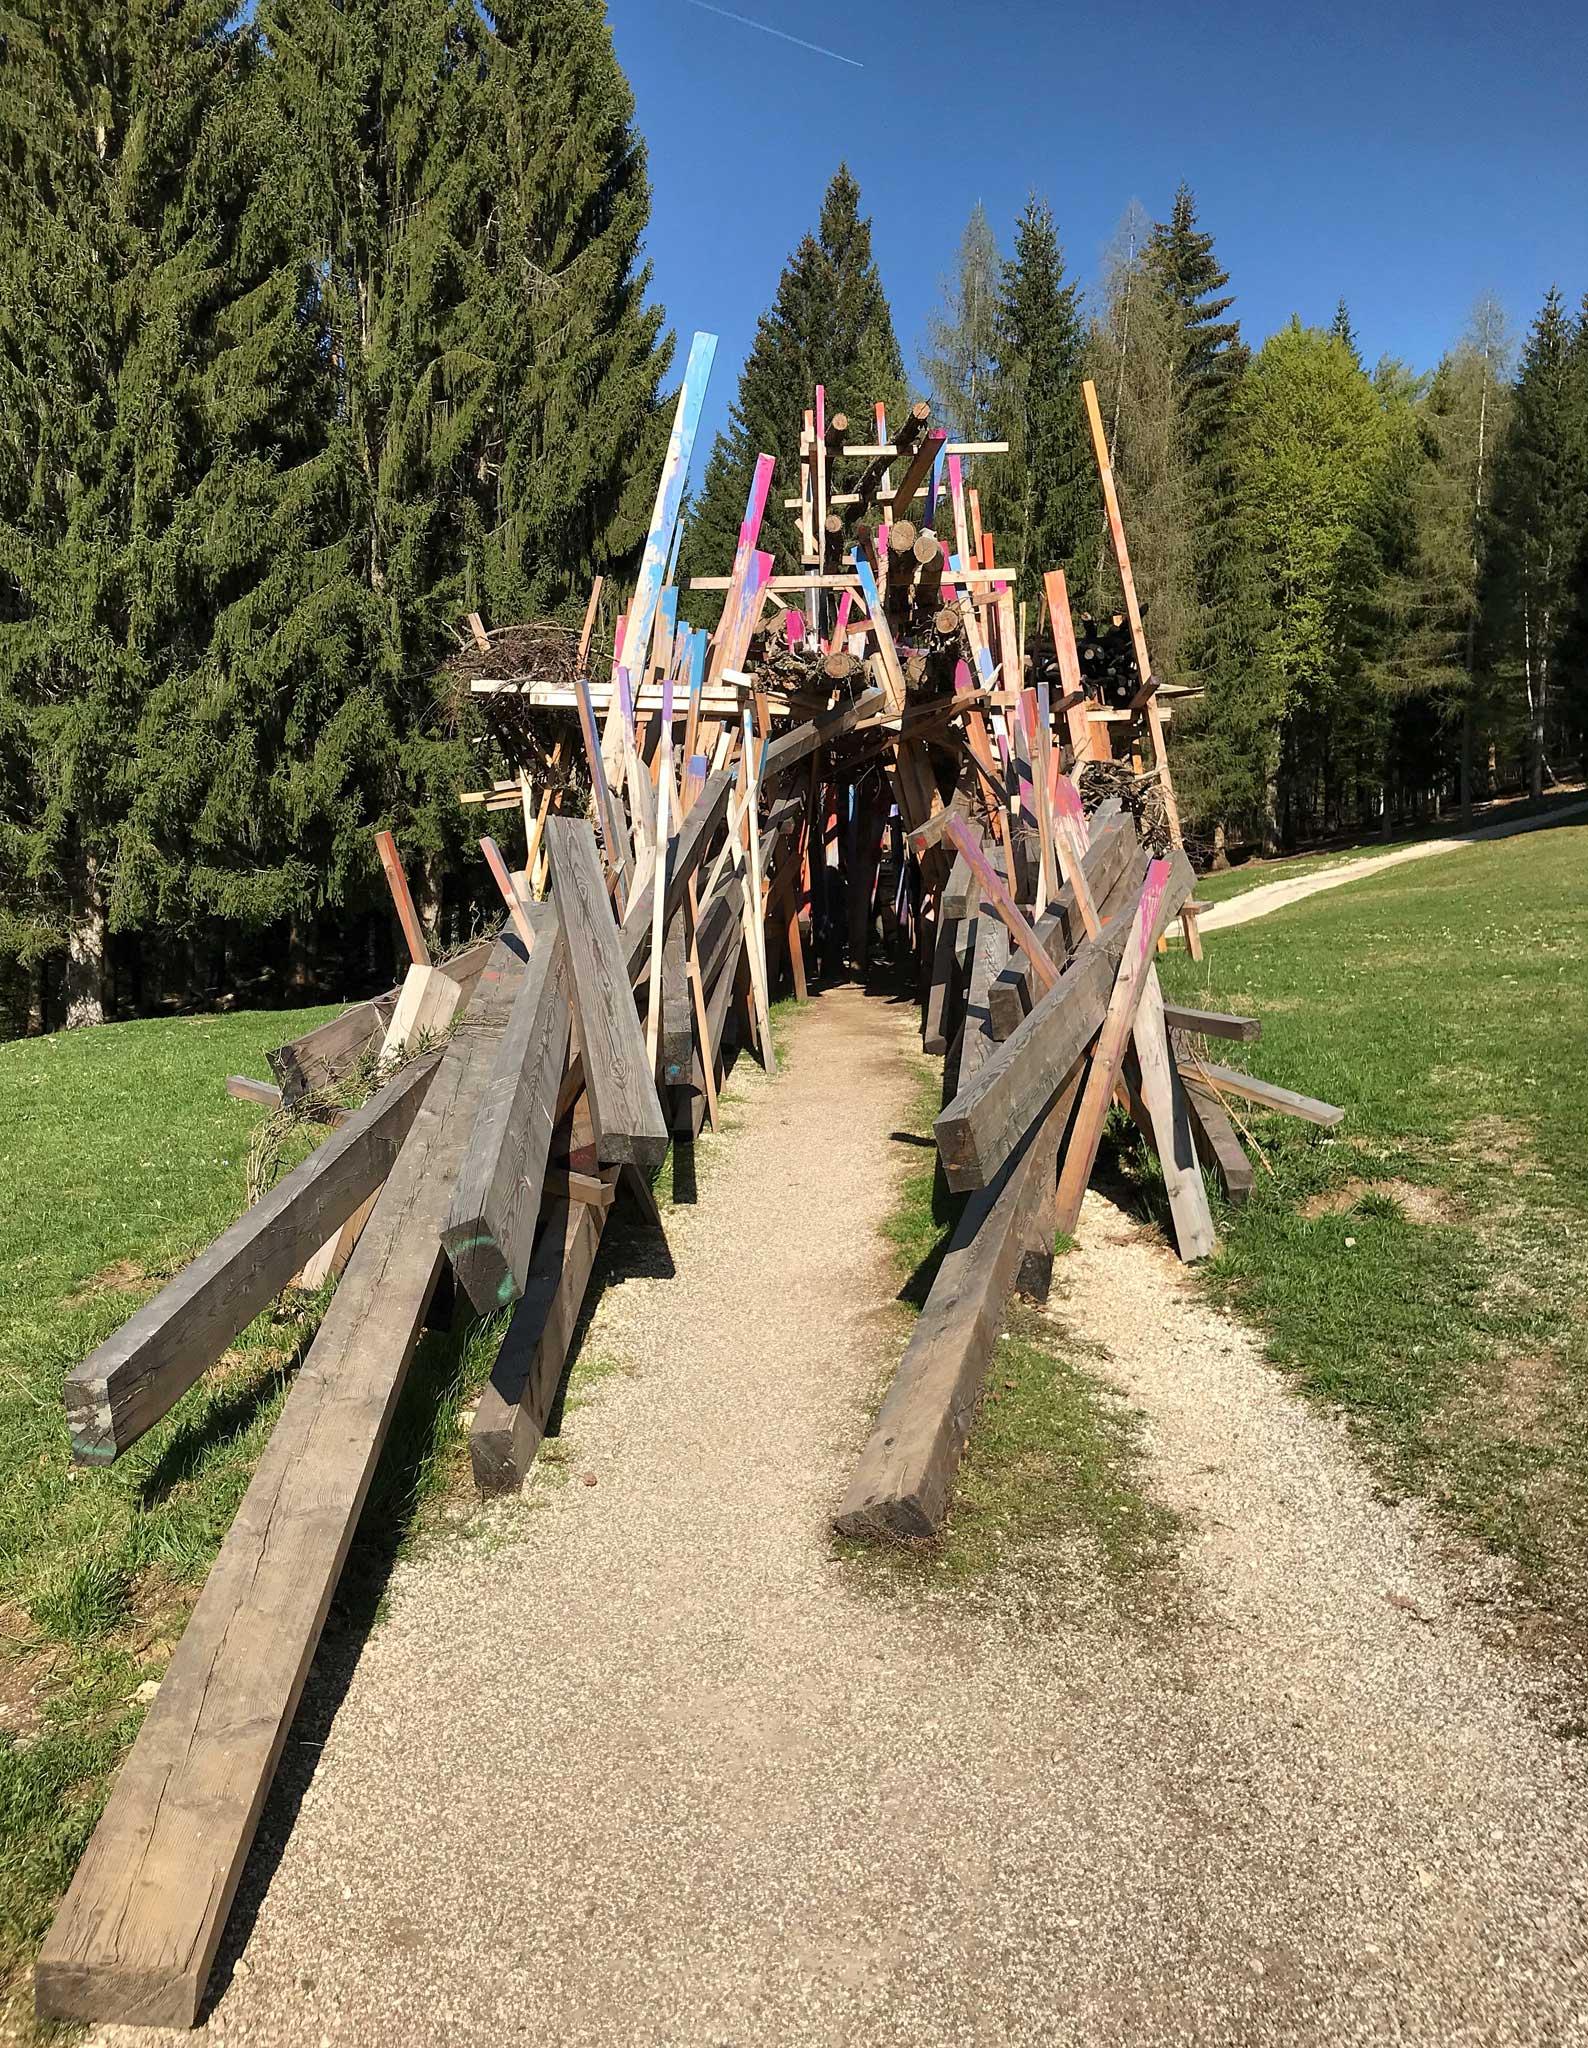 Arte-Sella-Valsugana-land-art-Quinze-Trabucco-di-Montagna-2017